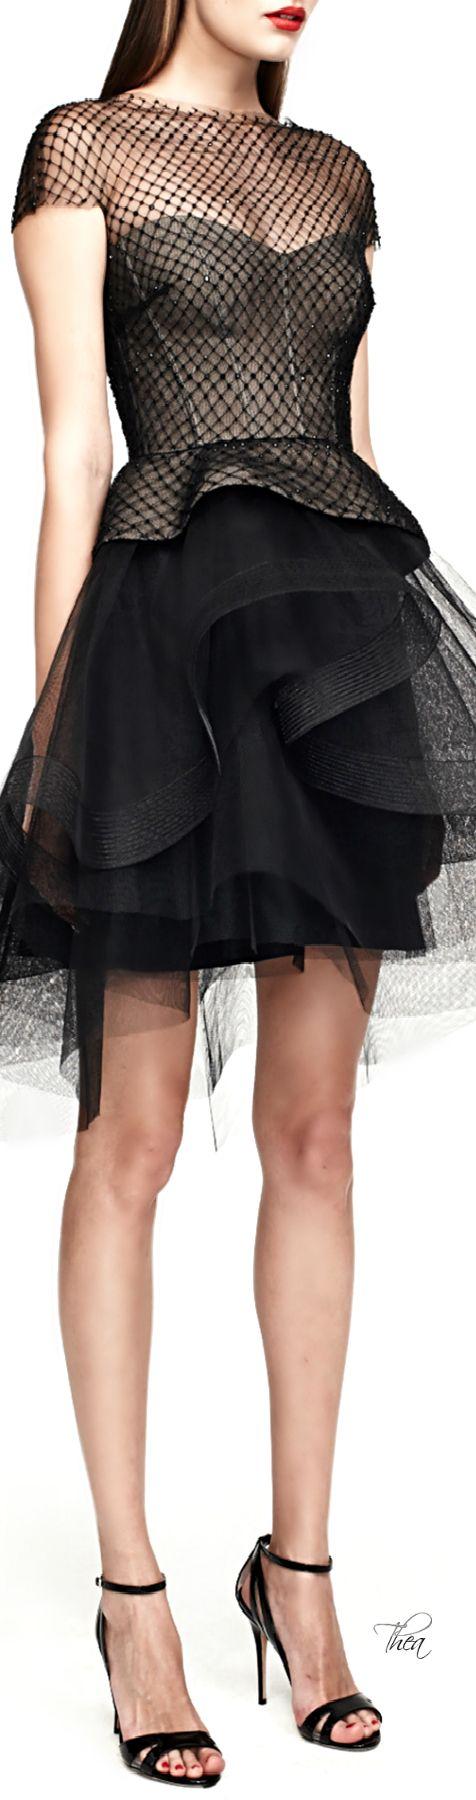 Monique Lhuillier ● SS 2015, Peplum Cocktail Dress With Tiered Skirt